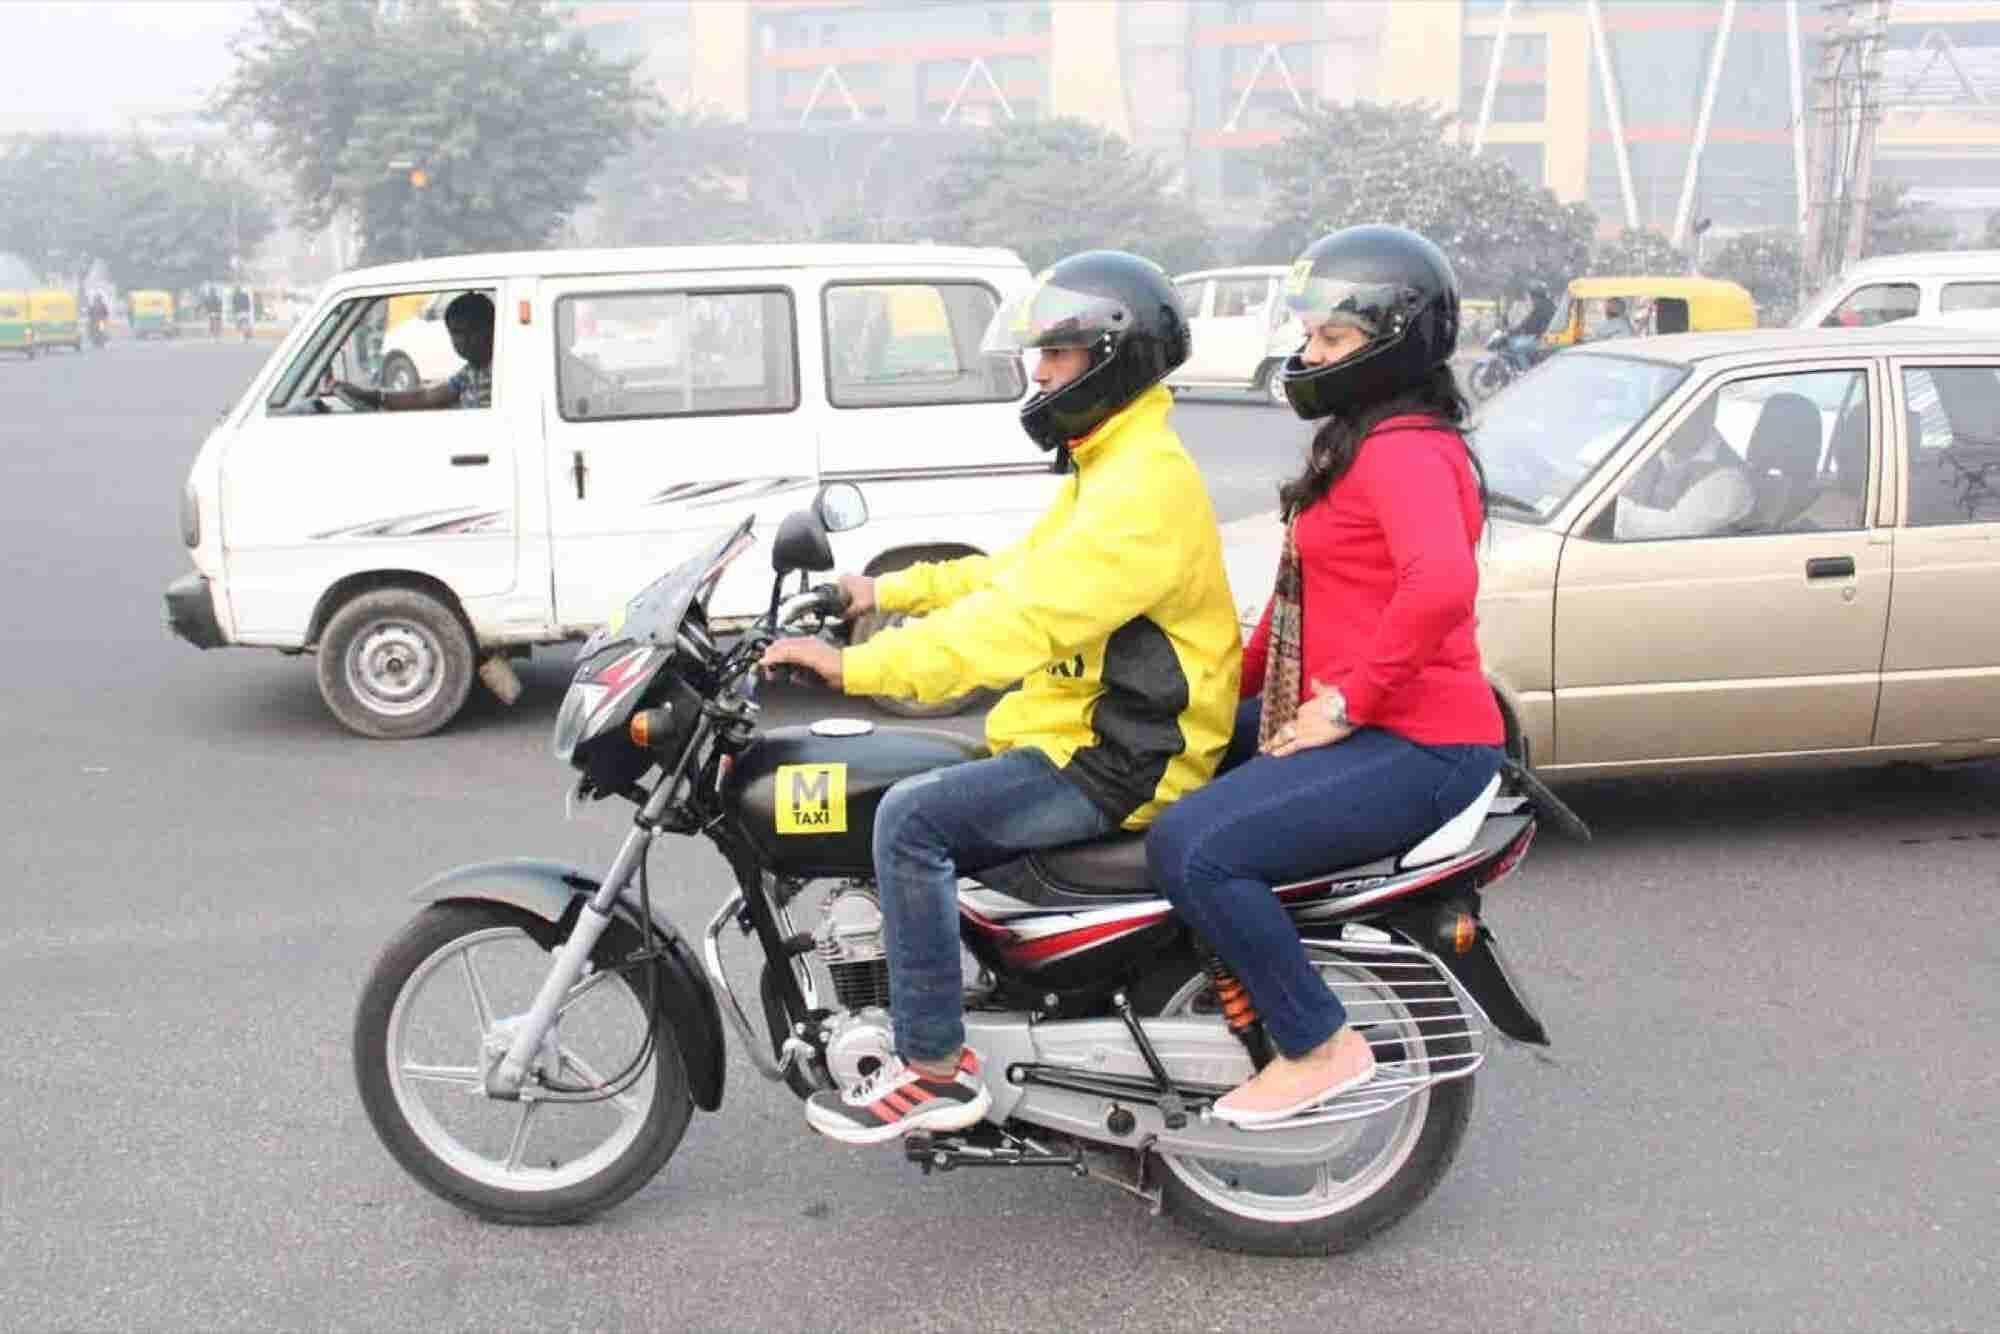 Ride Sharing Apps Welcome Odd-Even Scheme